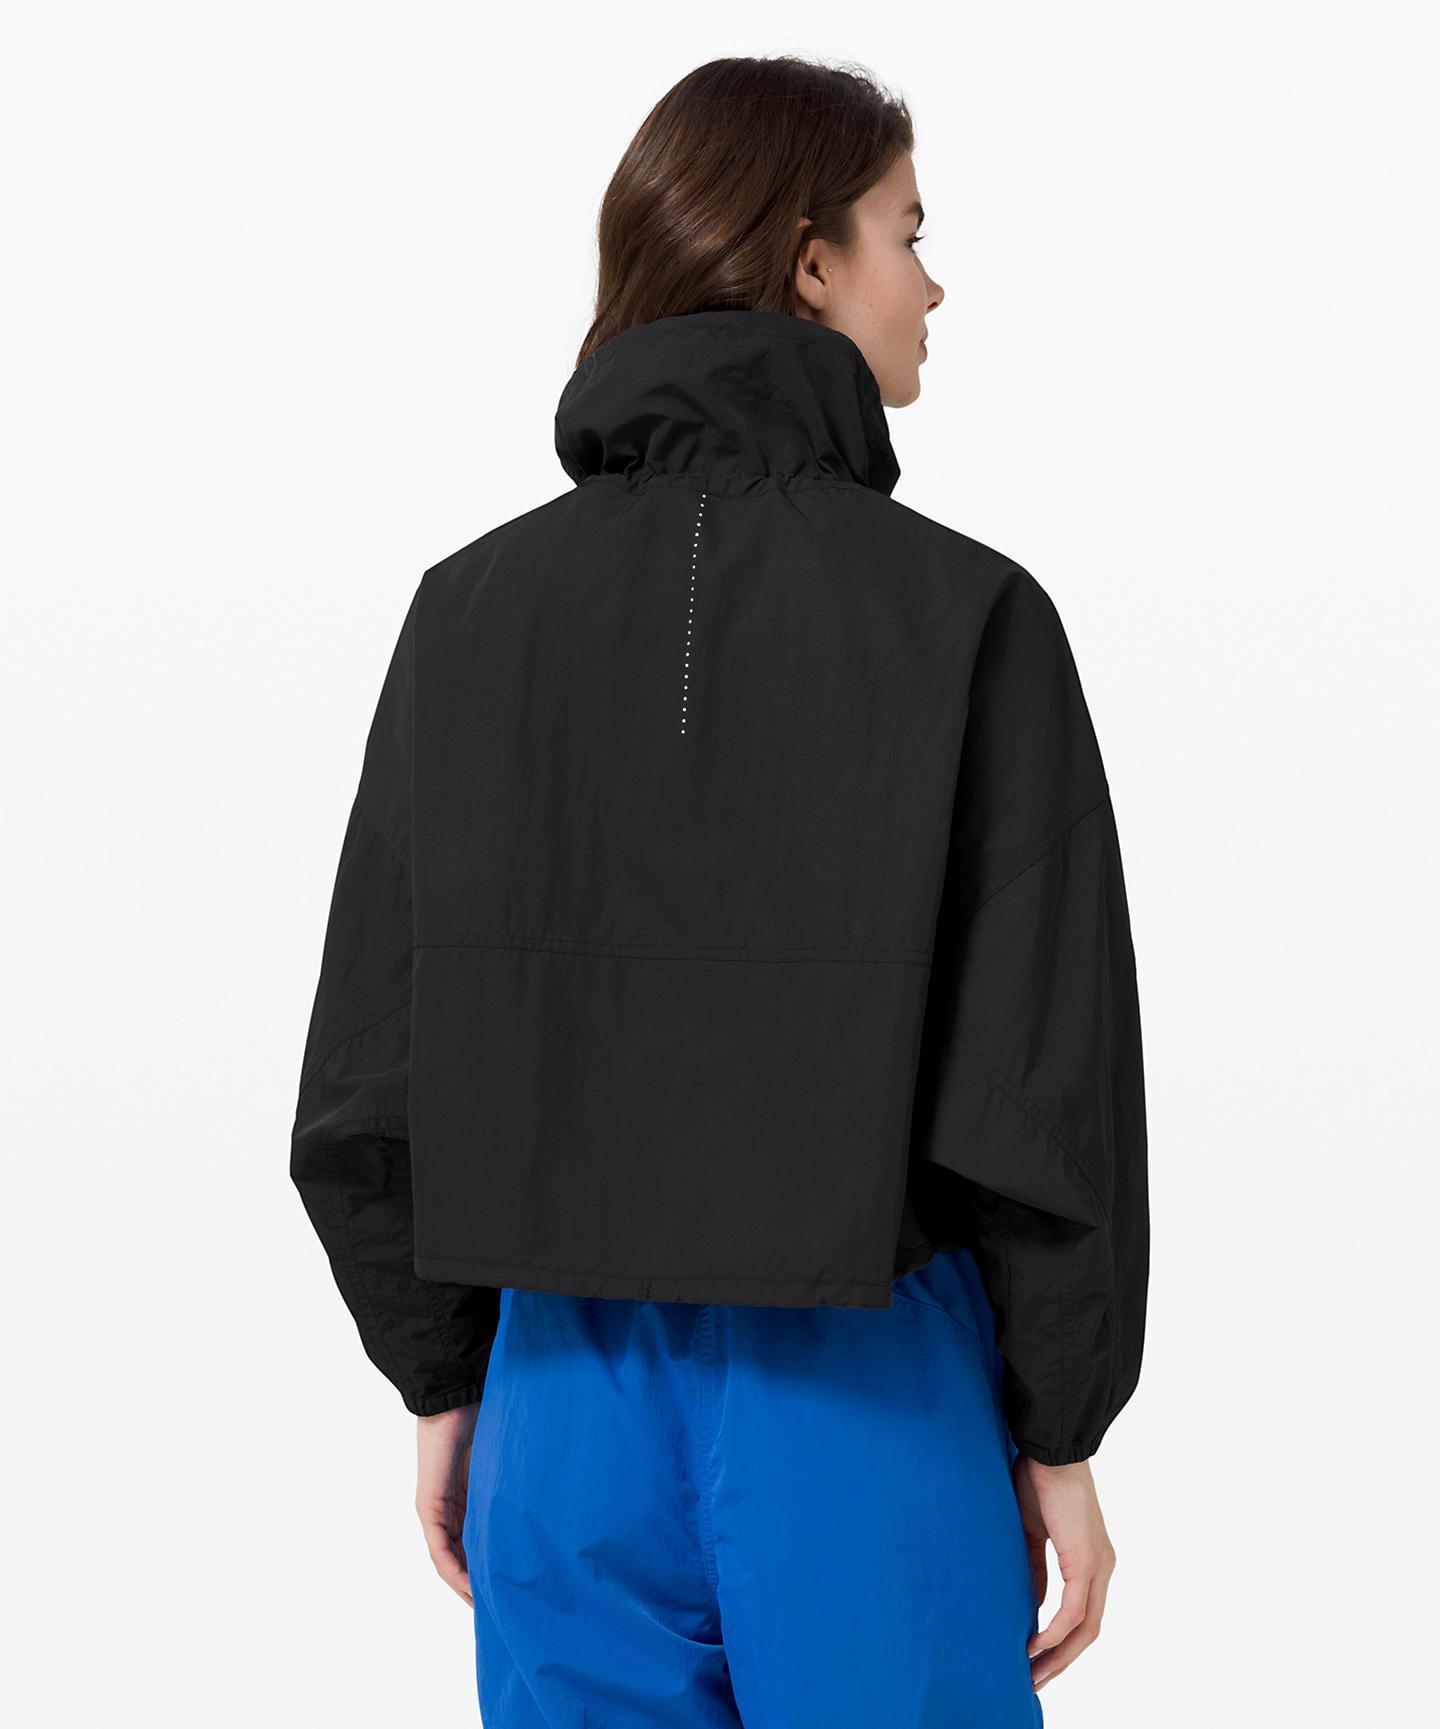 Break The Mold Pullover